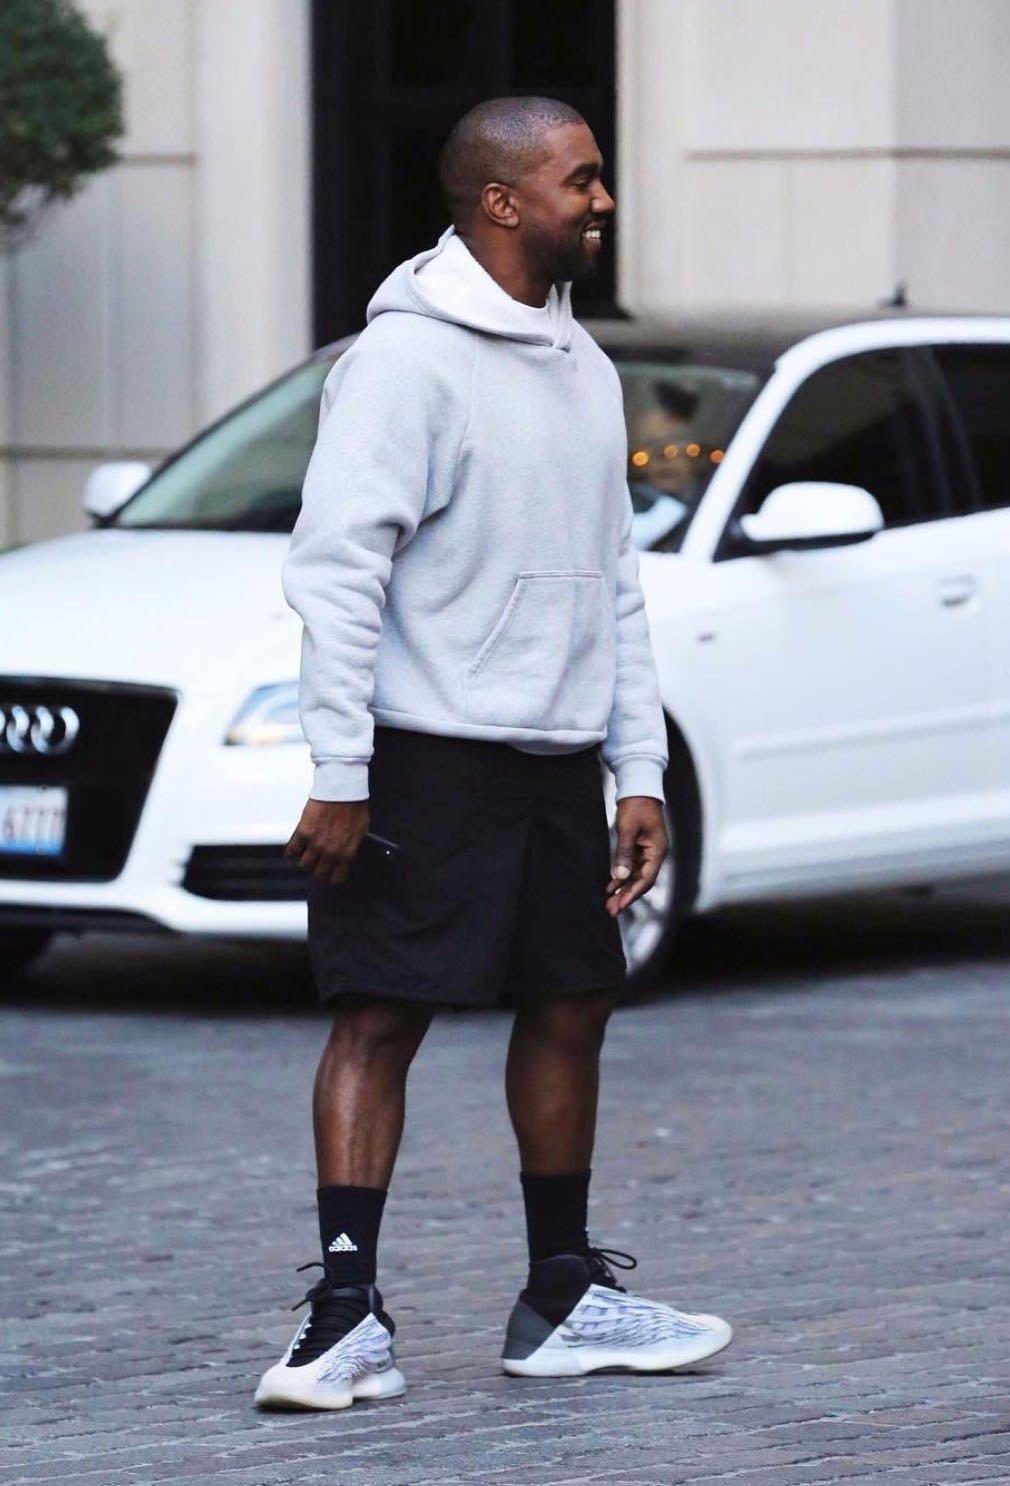 kanye wearing yeezy sesame